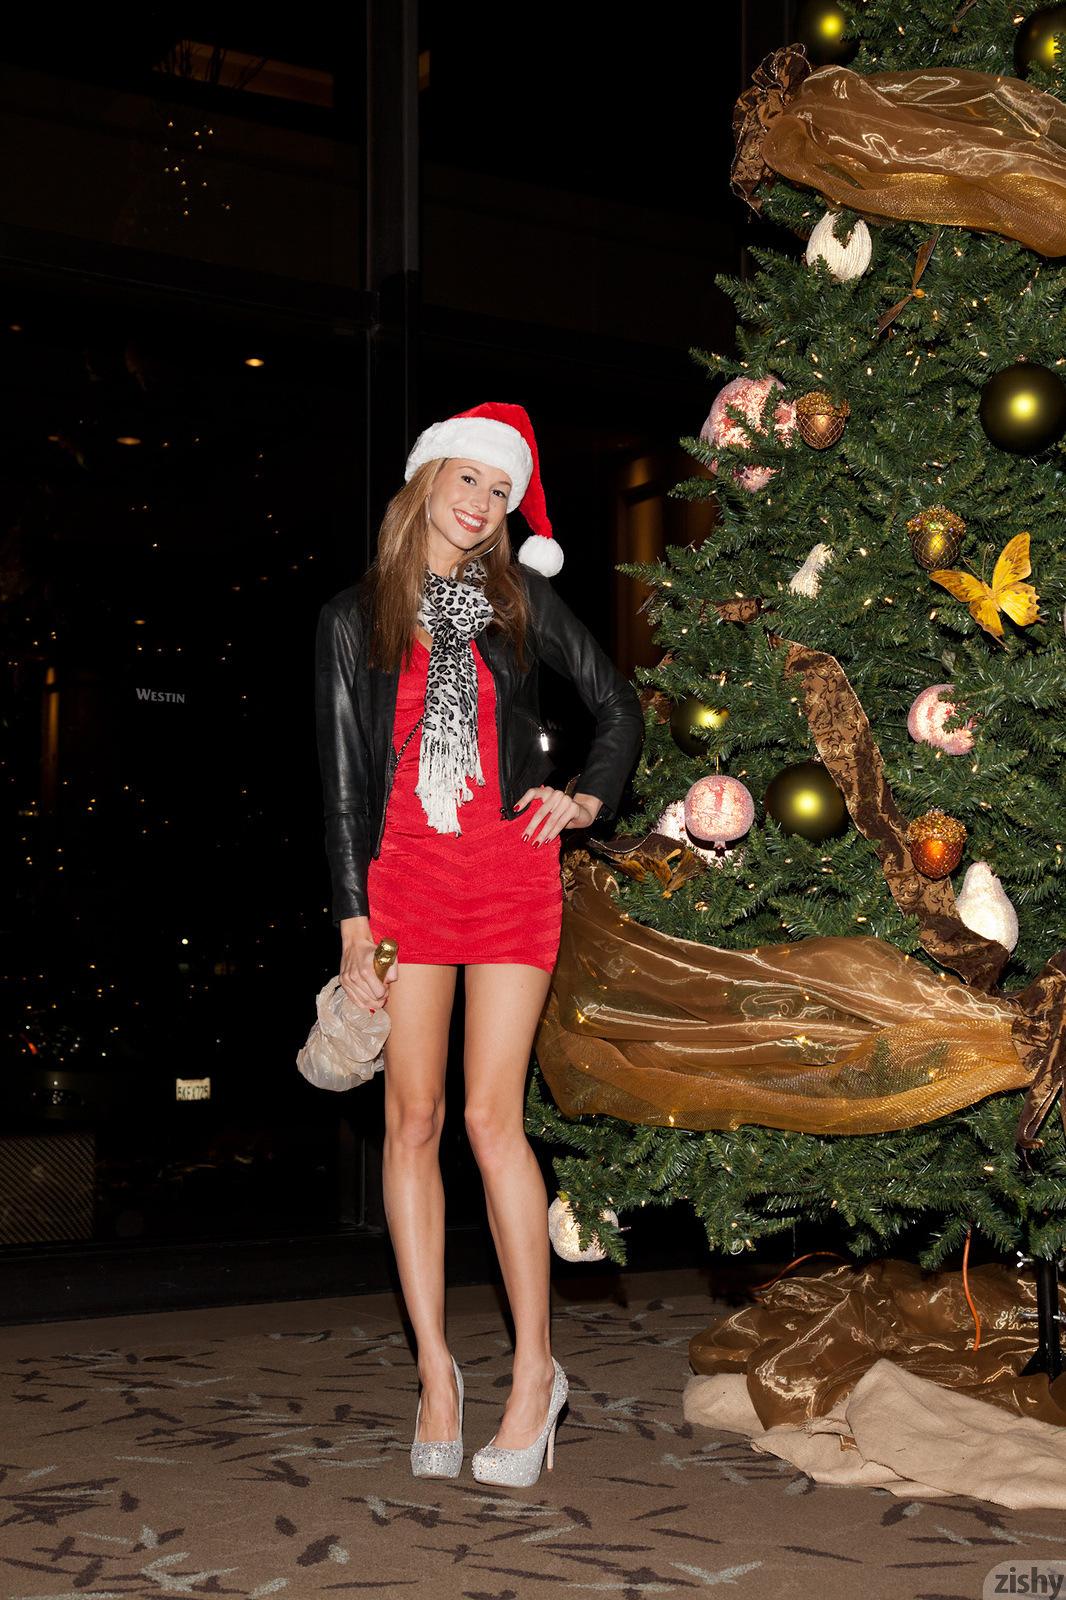 Geri Burgess Holiday Party Red Dress Zishy 04 Redbust